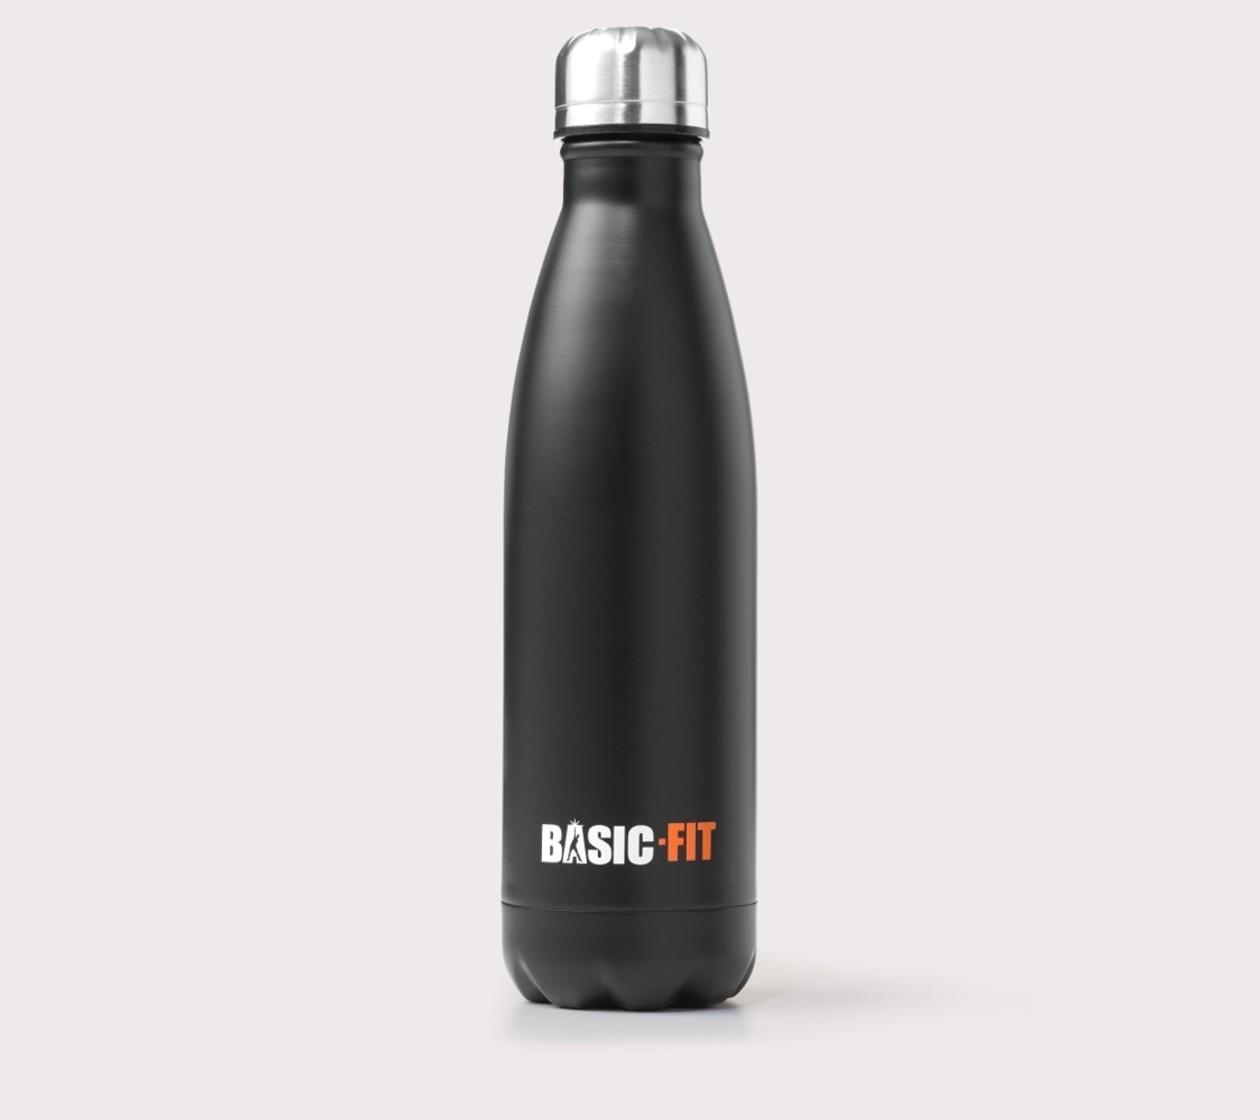 Botella de acero inoxidable negro